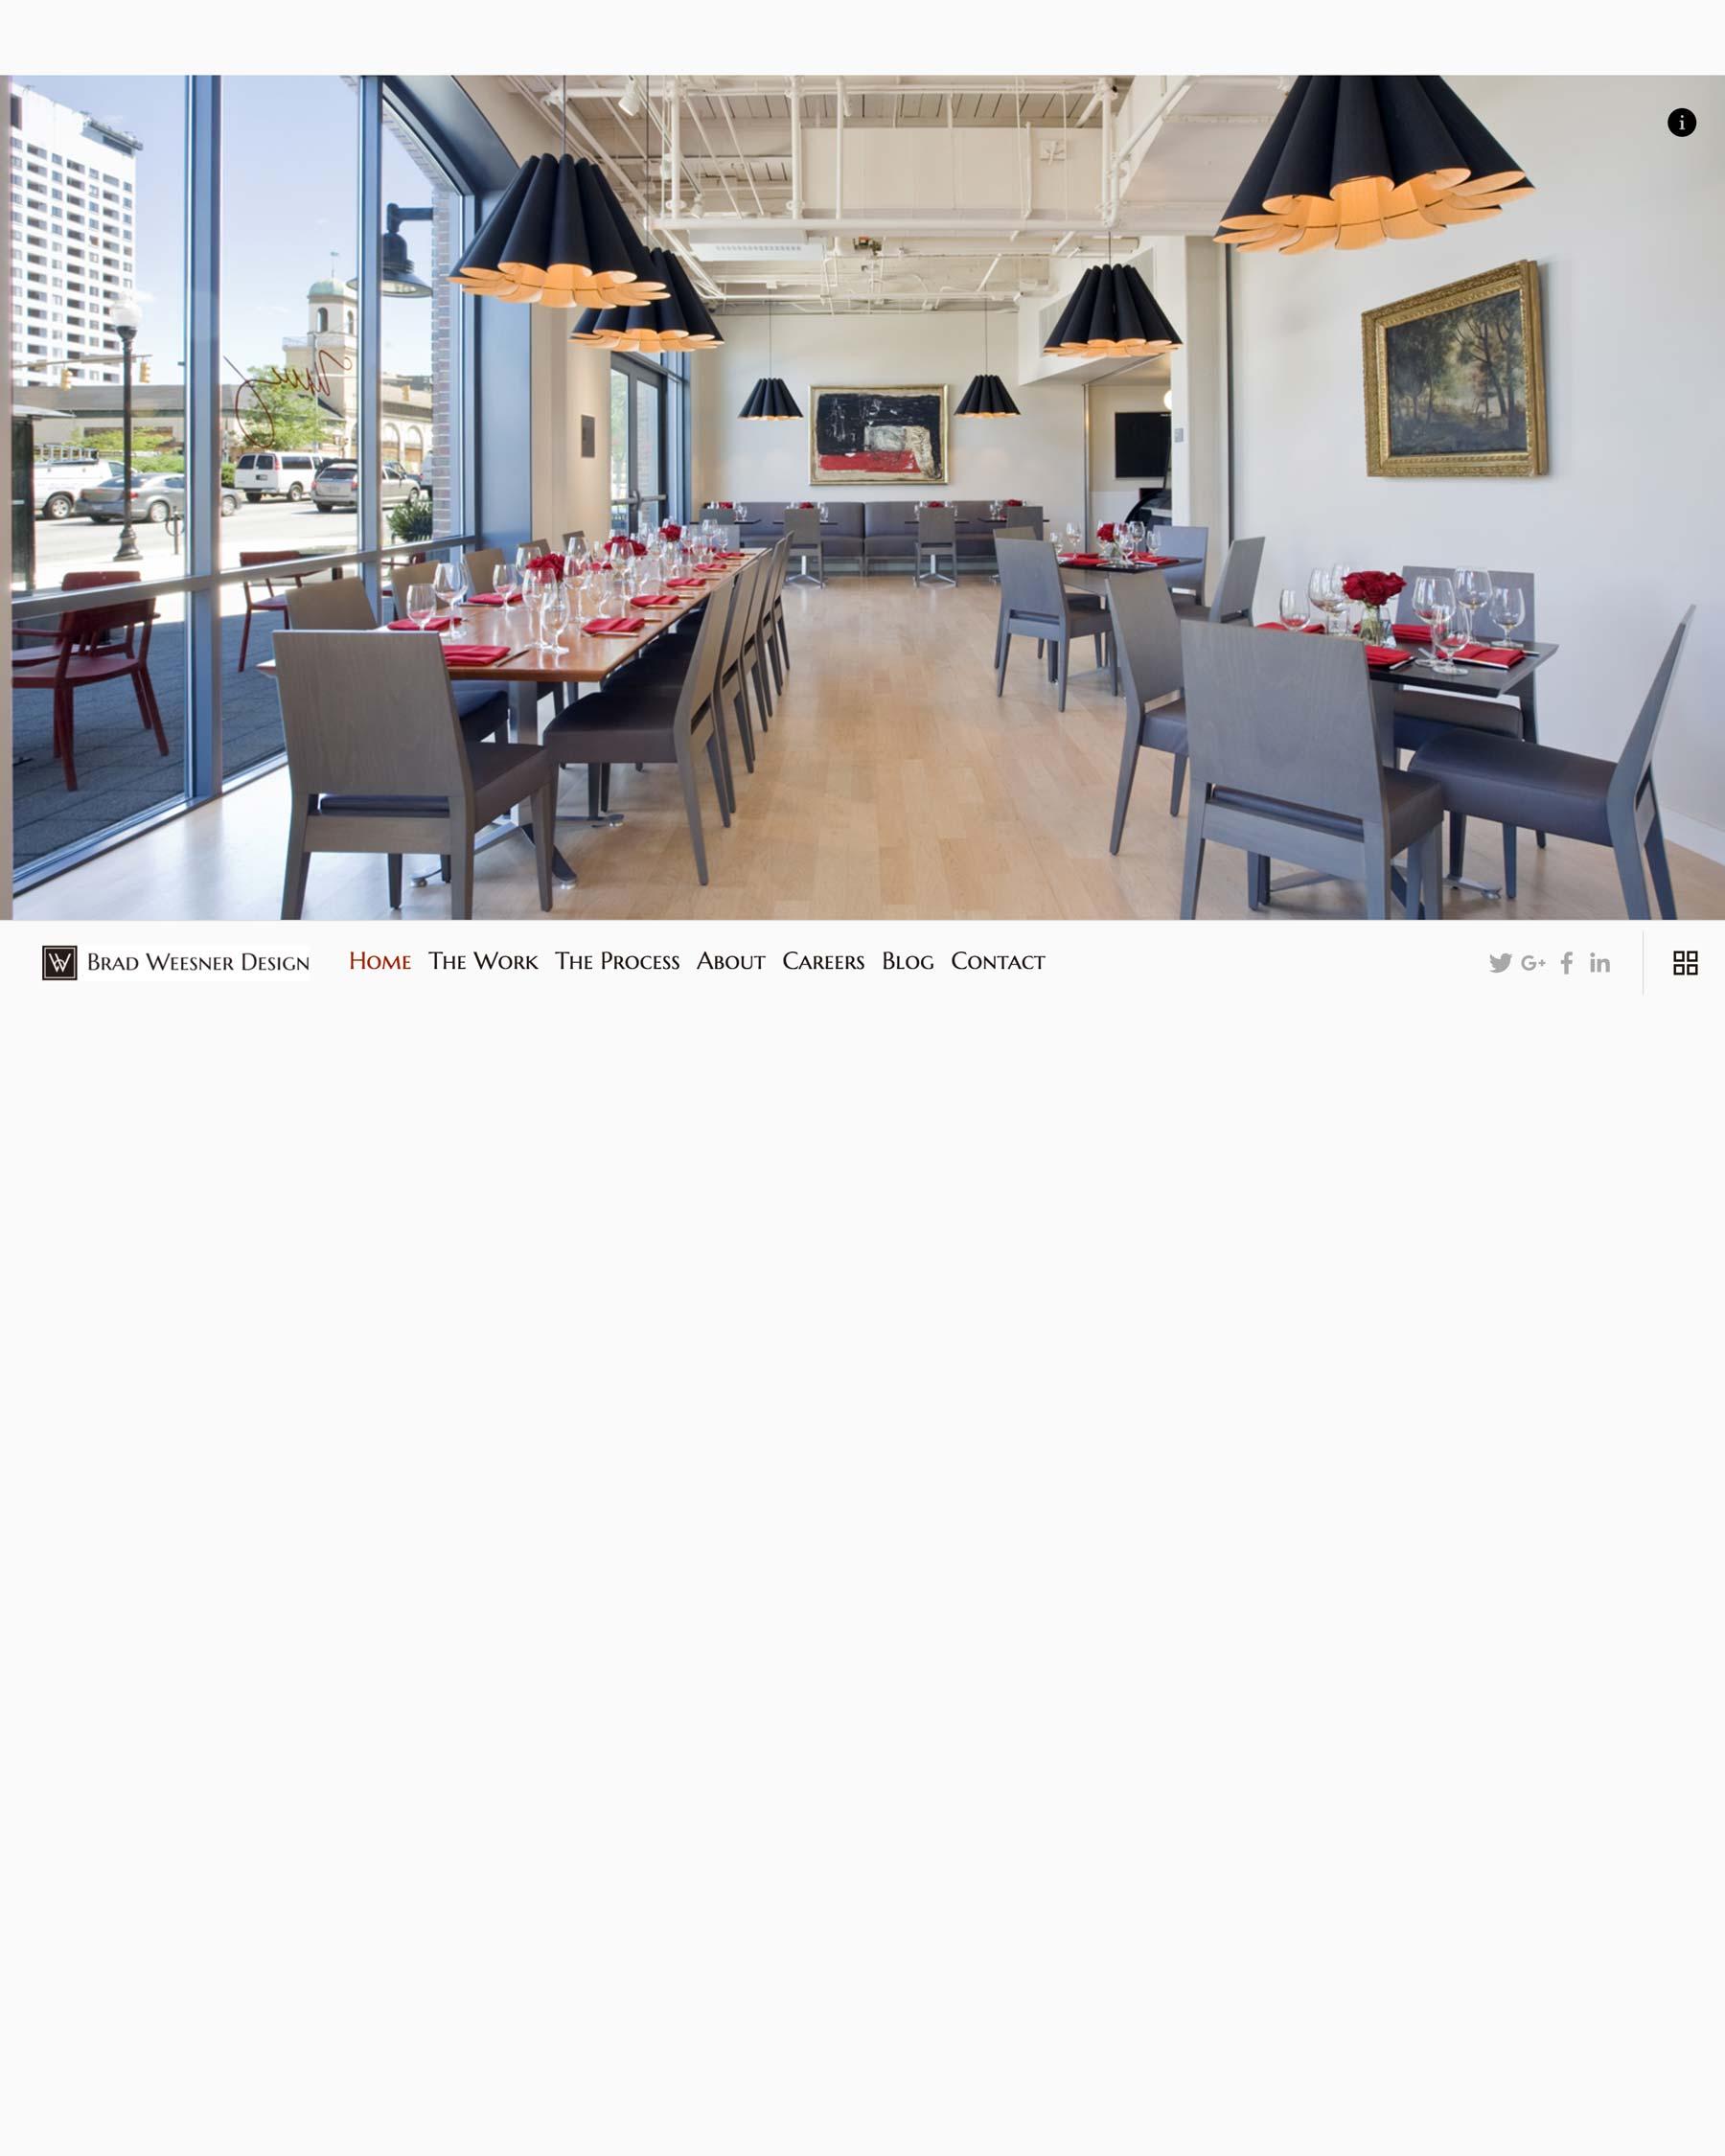 Brad Weesner Design - A Residential, Academic, and Commercial Interior Designer